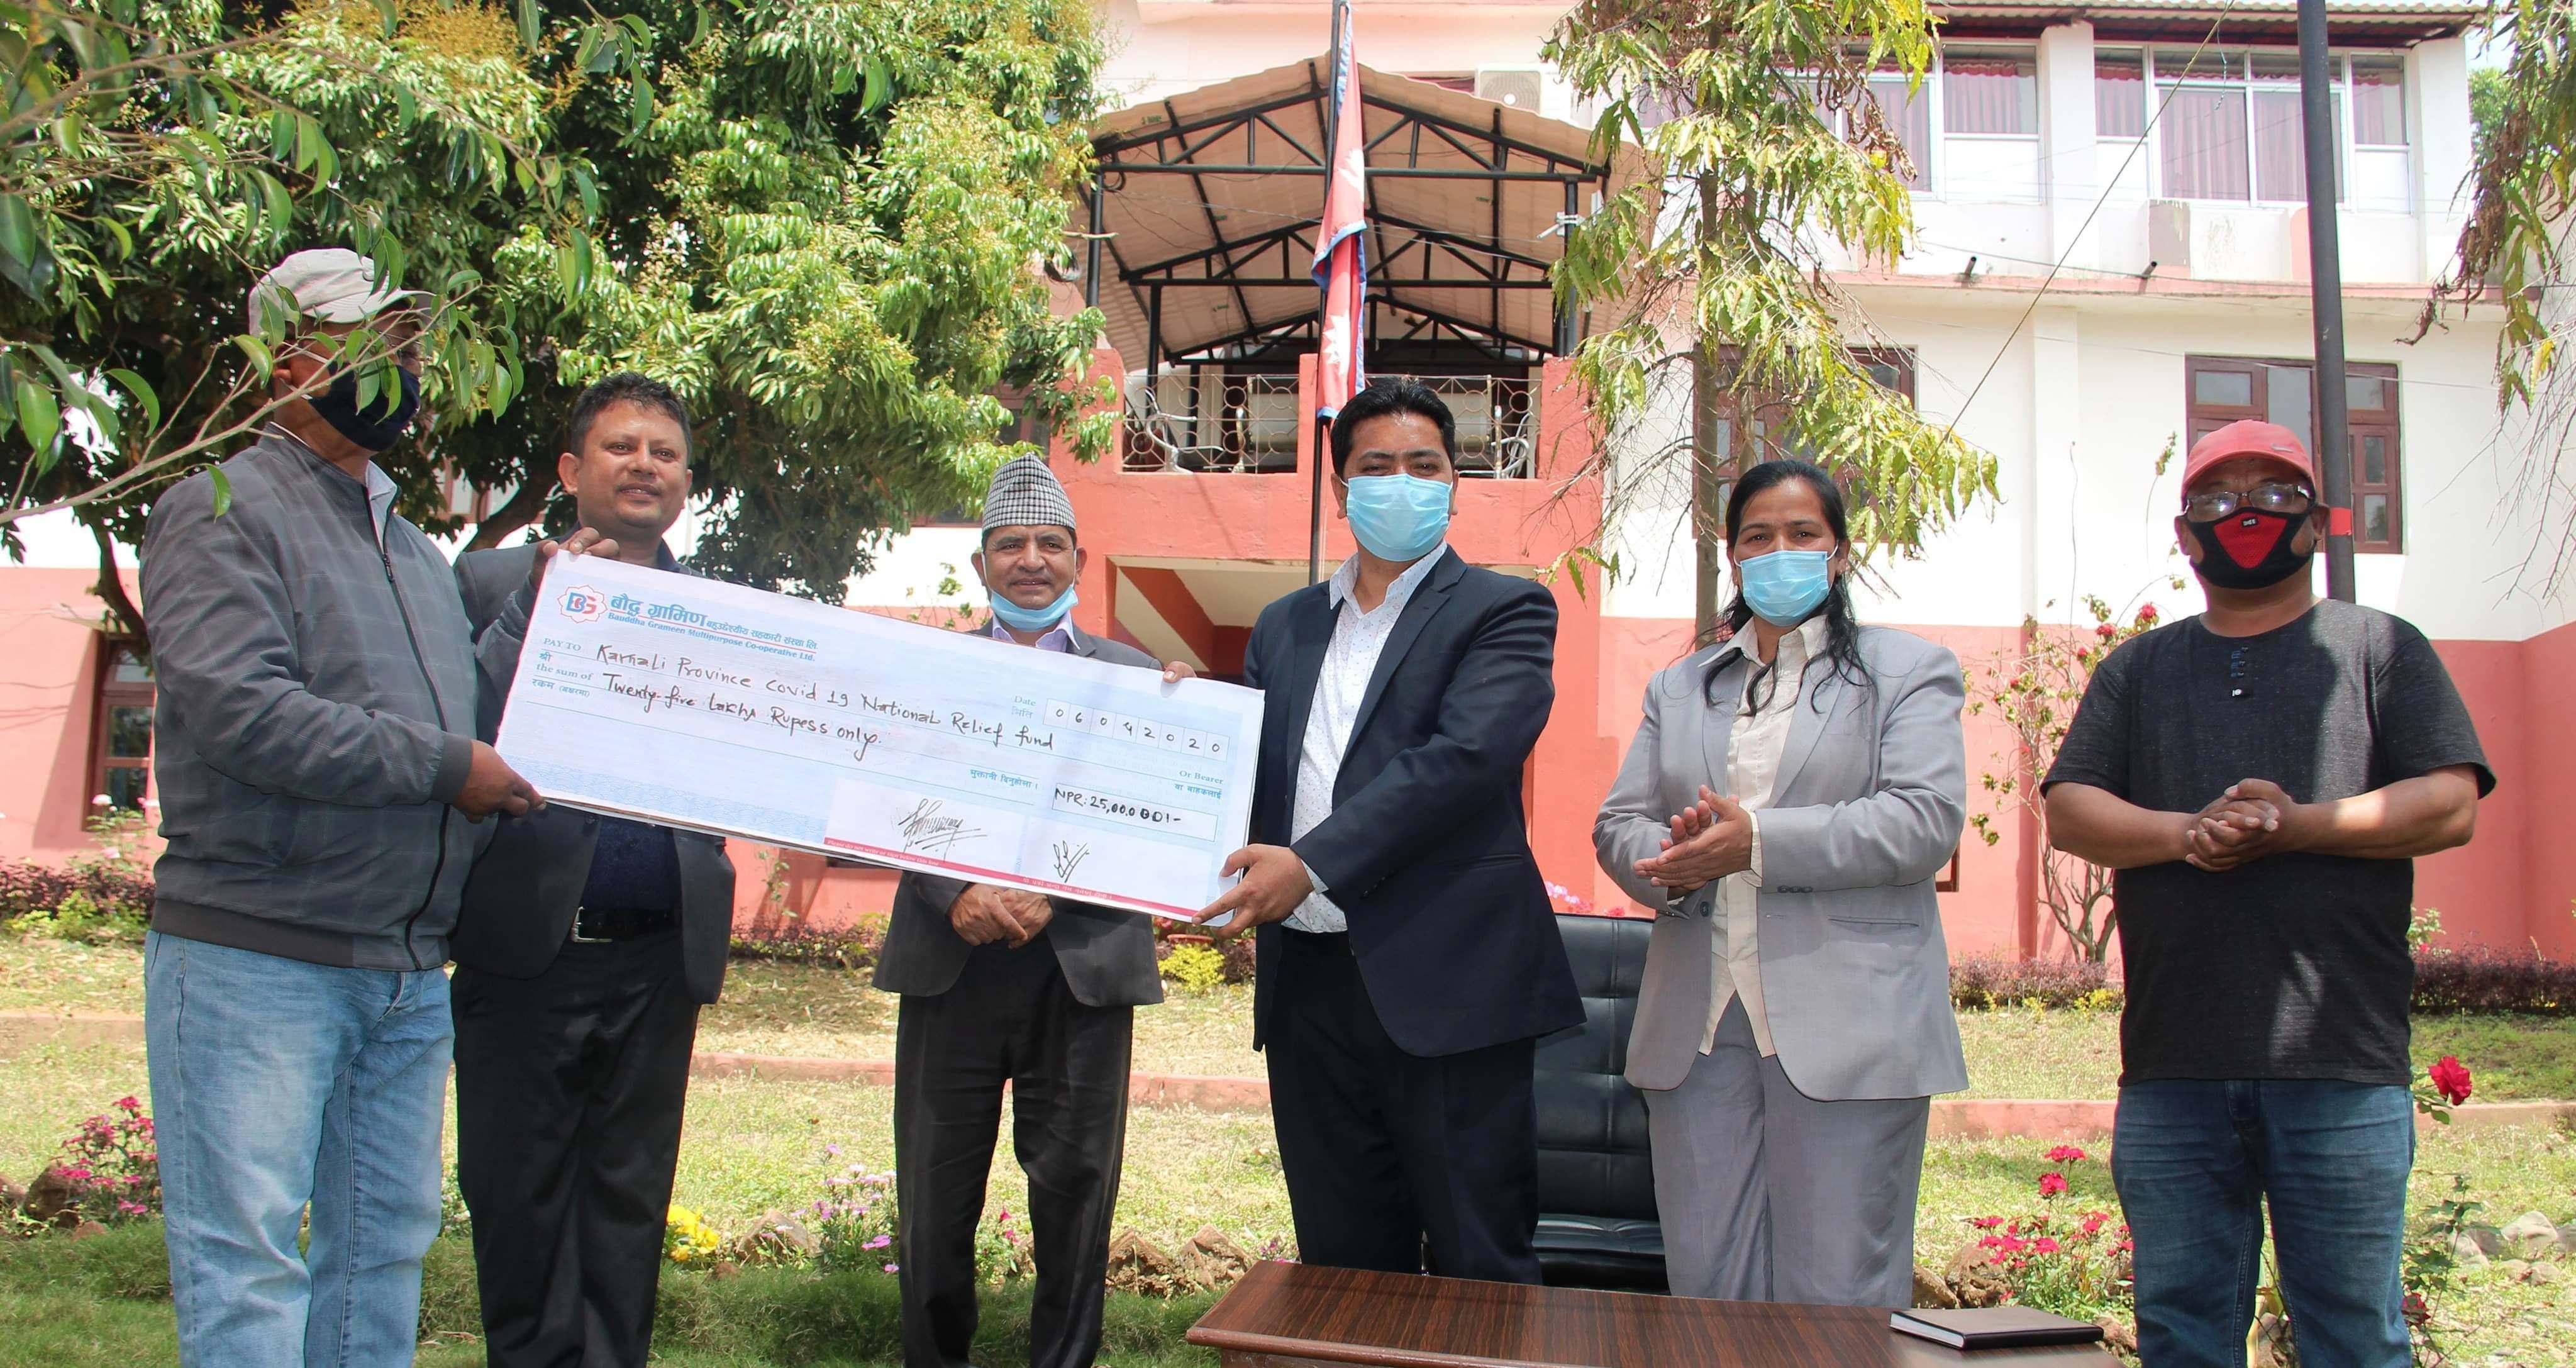 प्रदेश विपद् व्यवस्थापन कोषमा बौद्ध ग्रामीणको २५ लाख सहयोग